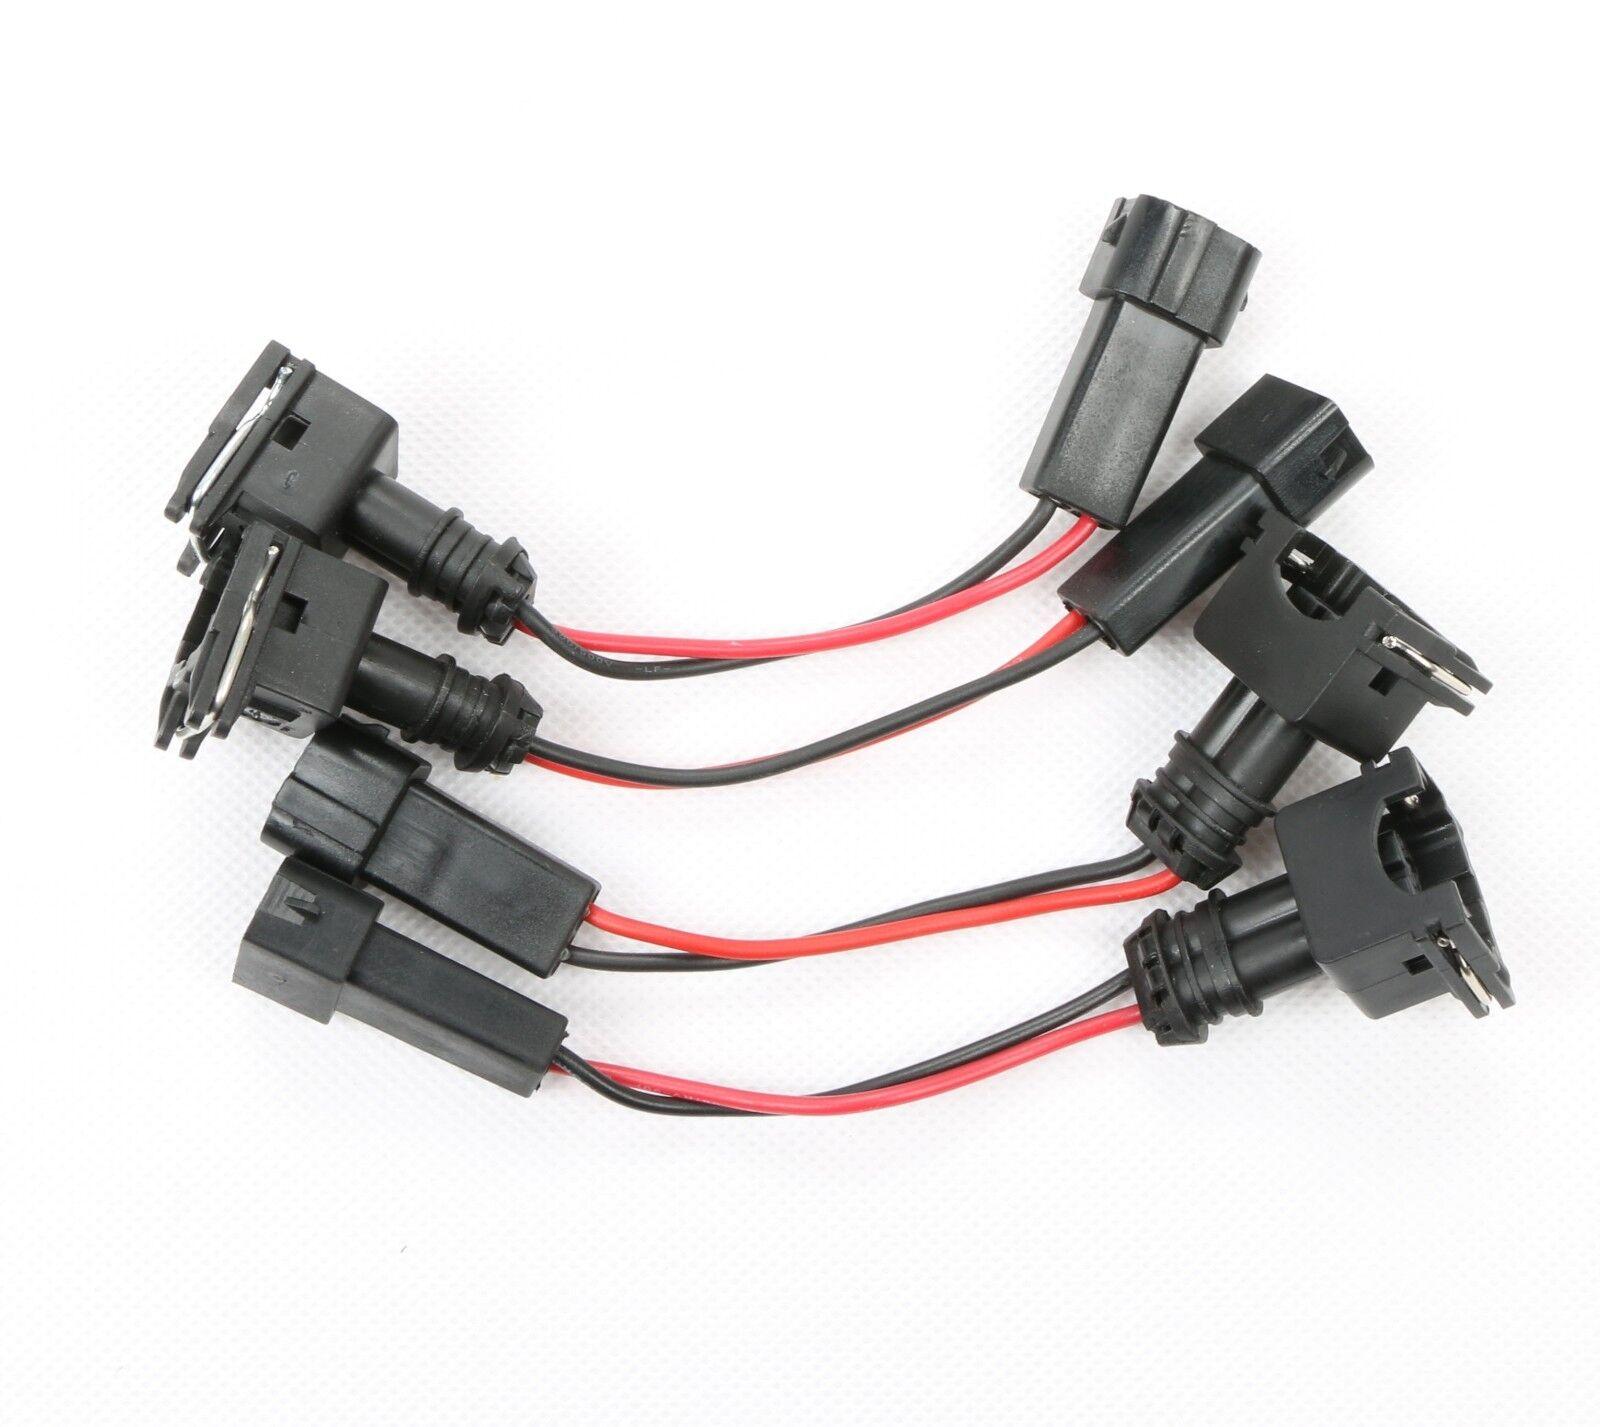 92 integra fuel injector wiring diagram bosch fuel